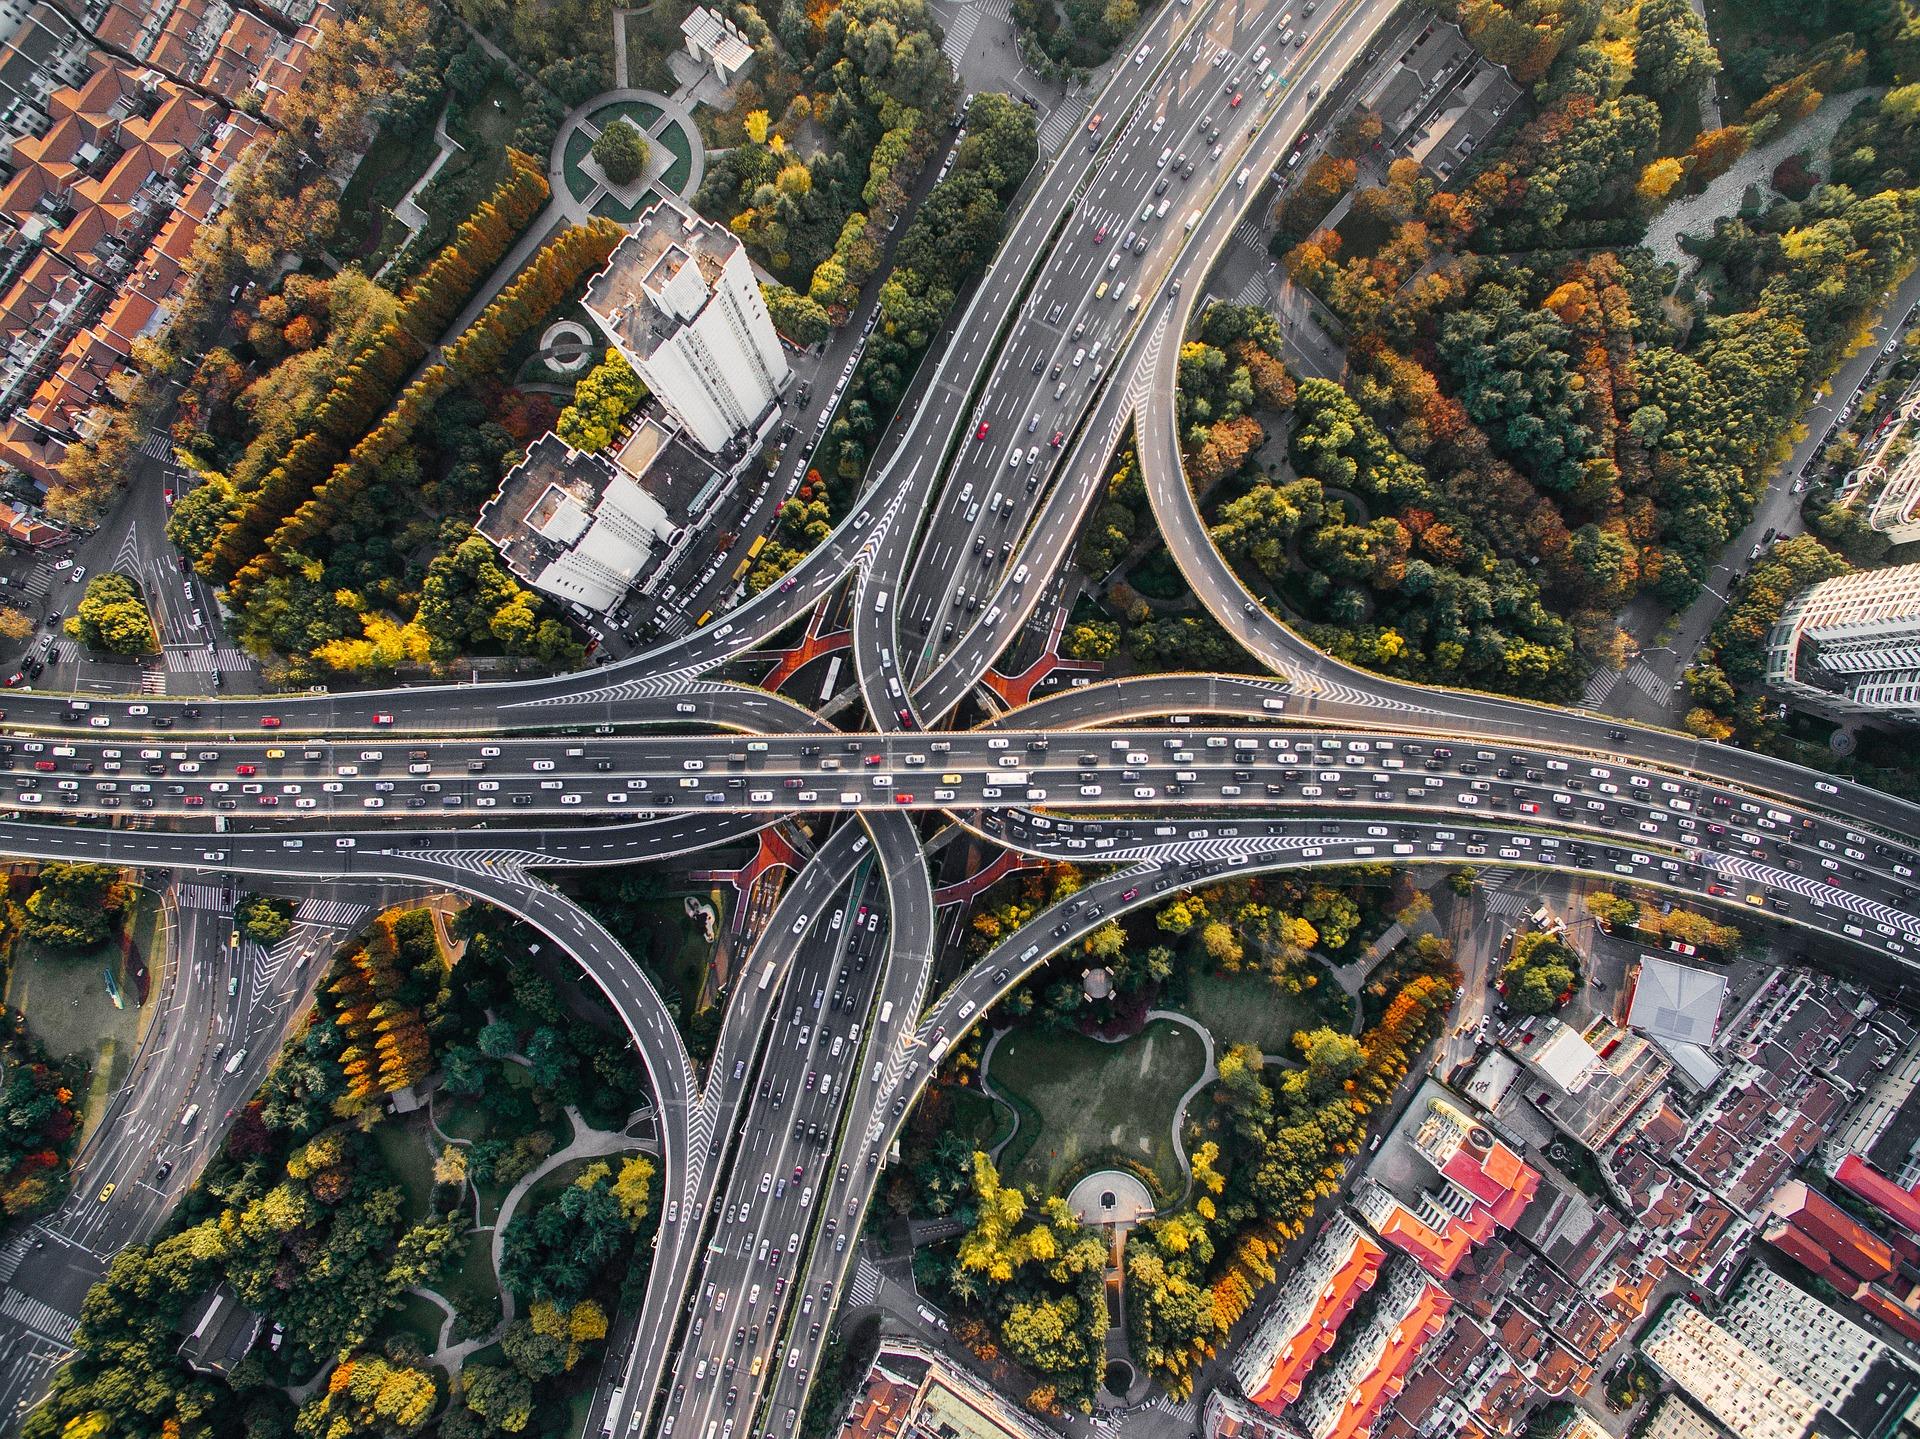 città congestionate